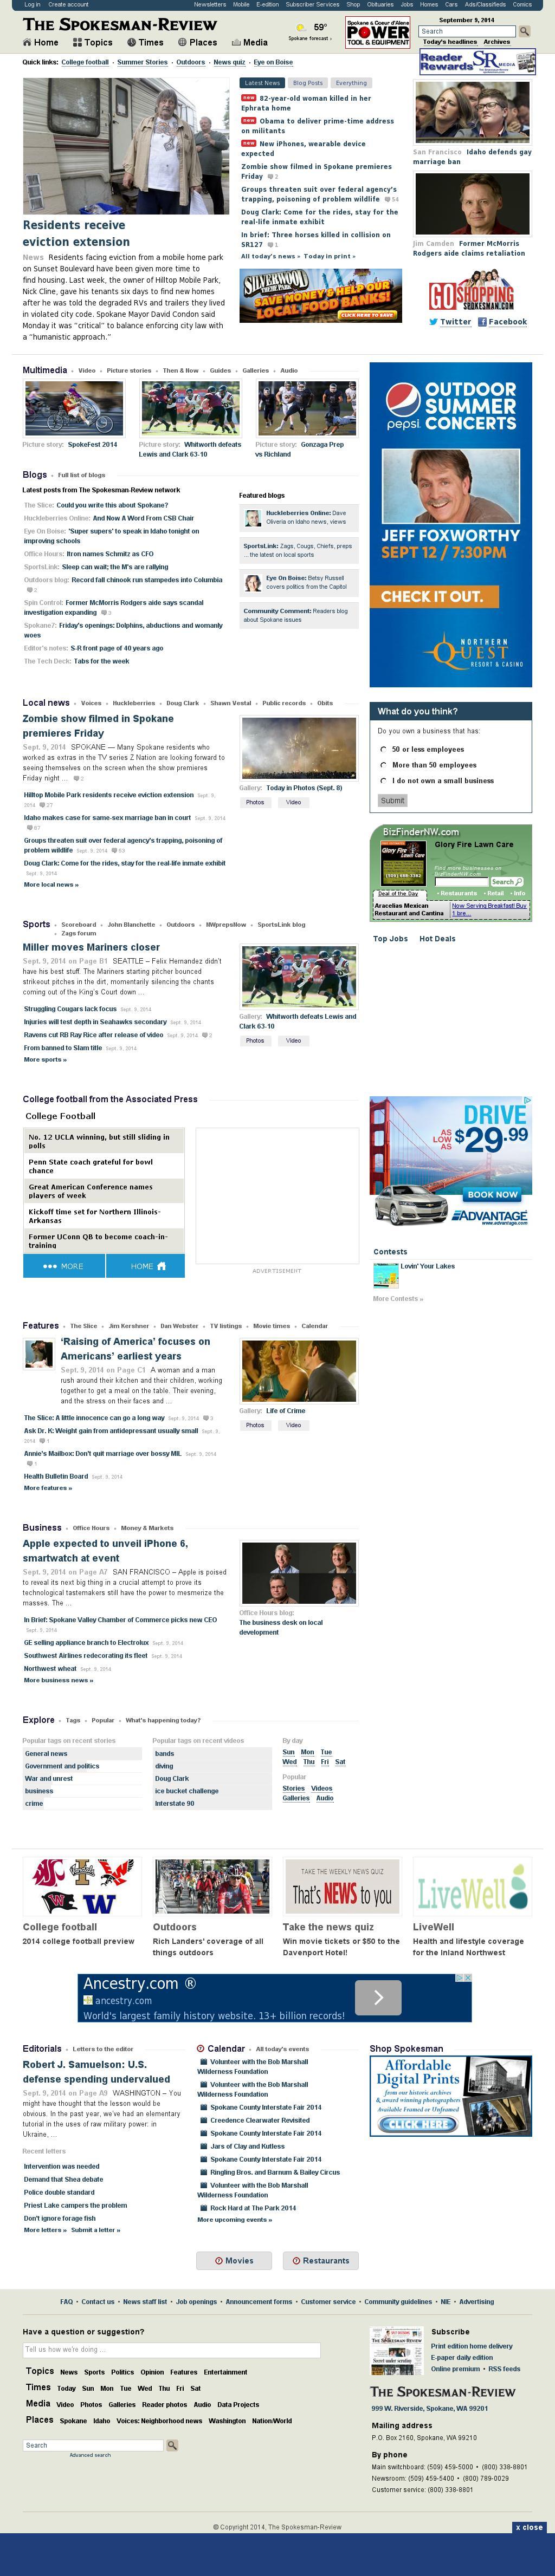 The (Spokane) Spokesman-Review at Tuesday Sept. 9, 2014, 6:20 p.m. UTC